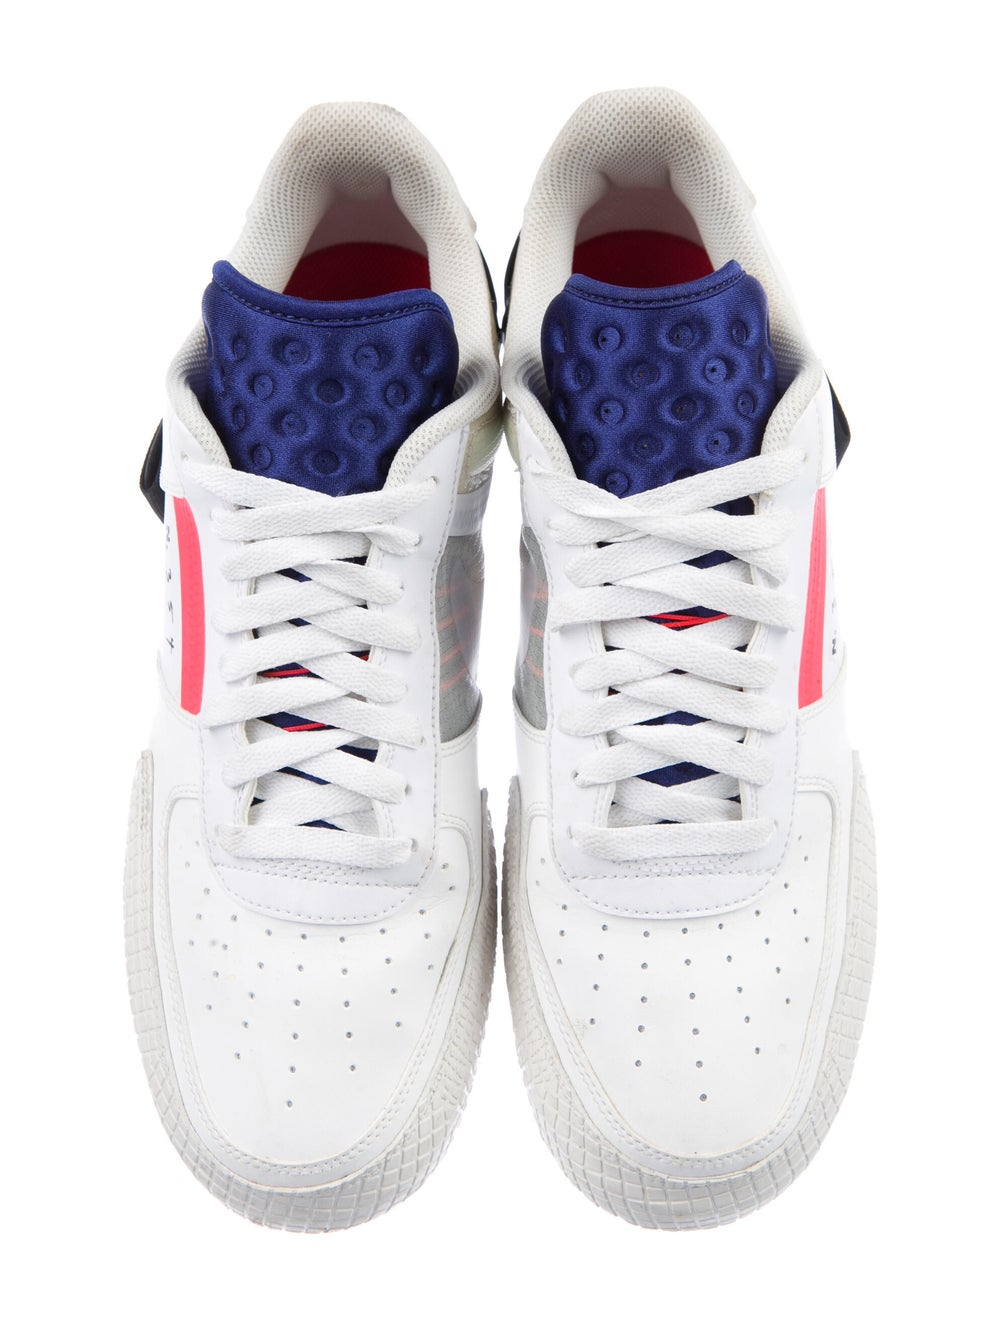 Nike Air Force 1 Type Sneakers - image 3